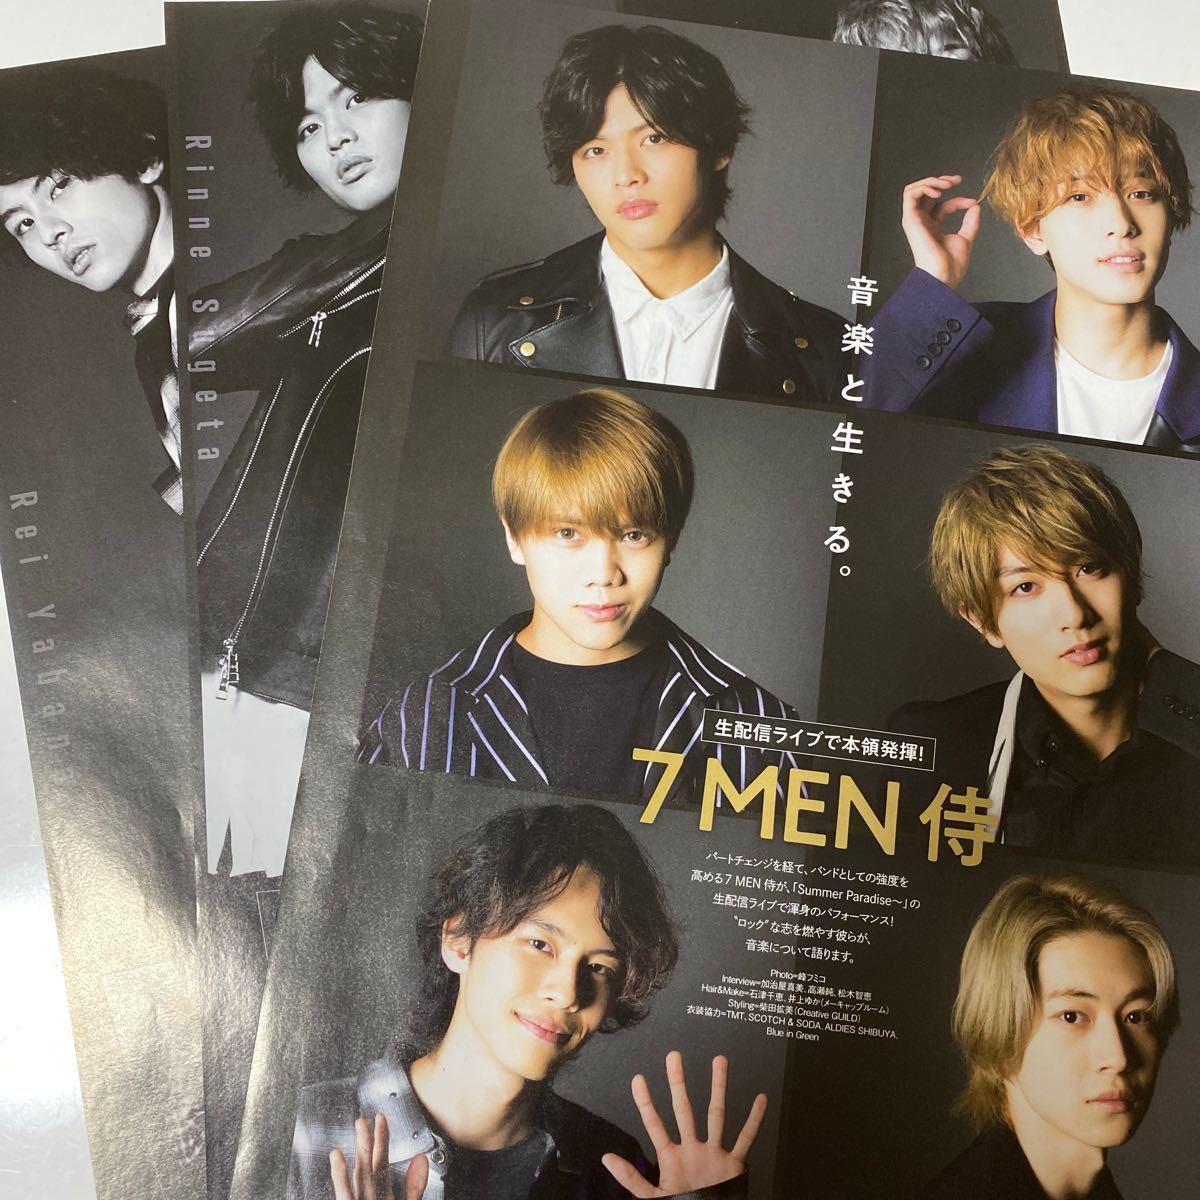 TVガイド 2020/8/21 7MEN侍